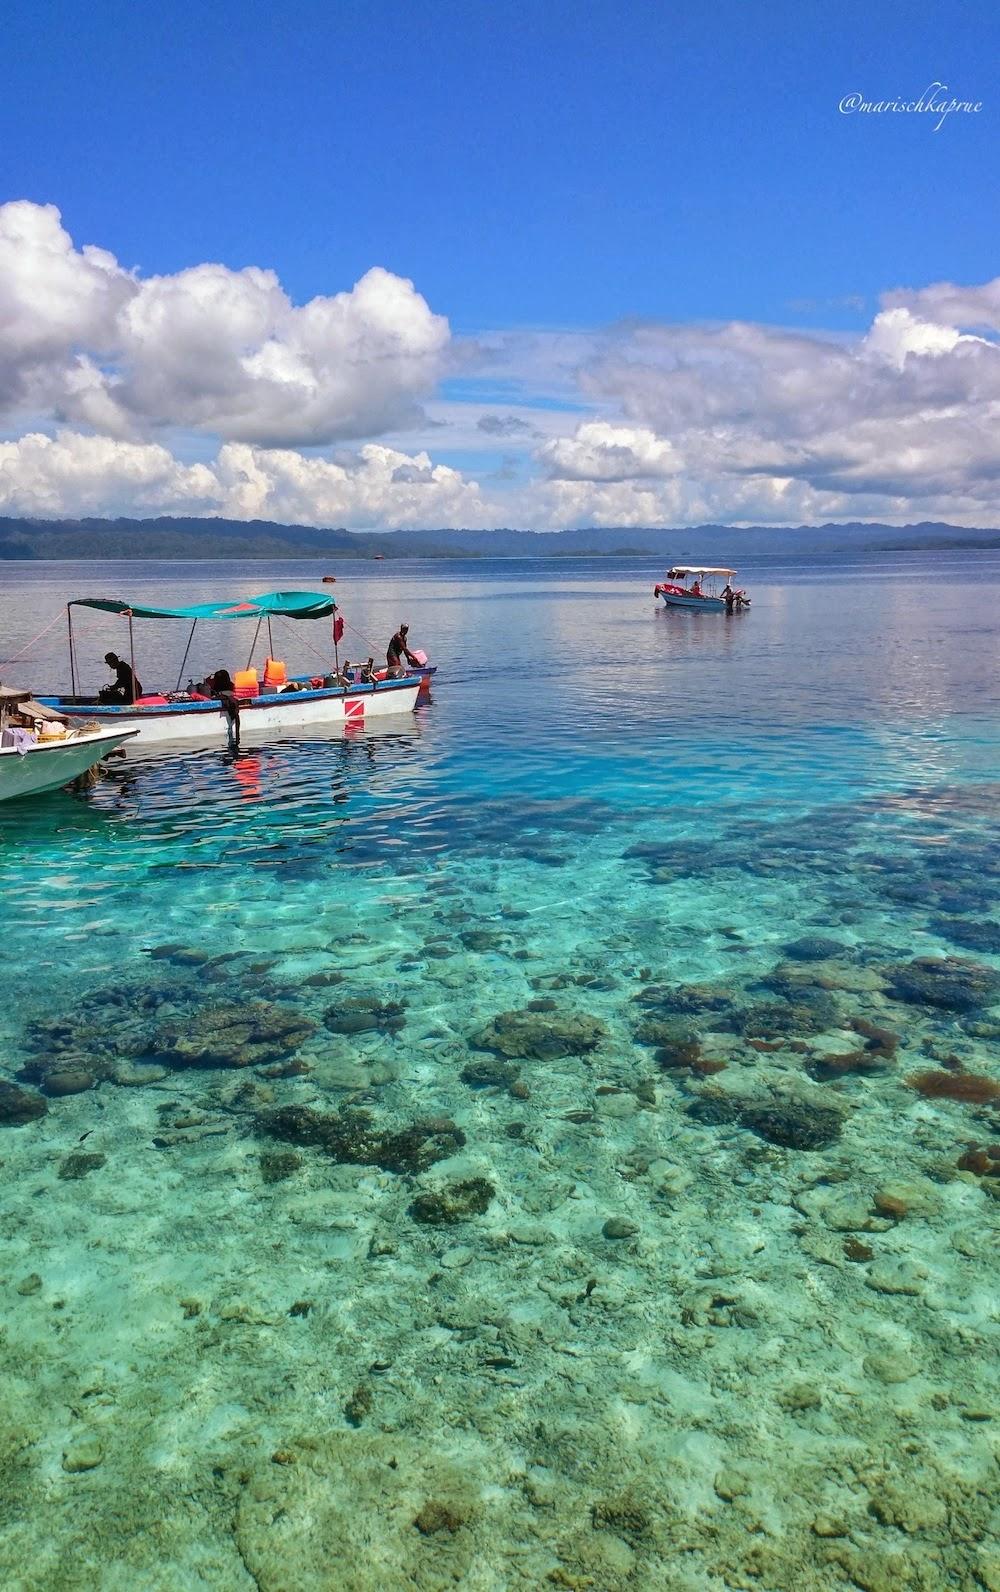 "<a href=""http://mataram.info/things-to-do-in-bali/visitindonesia-banda-marine-life-the-paradise-of-diving-topographic-point-inward-fundamental-maluku/"">Indonesia</a>best destinations : Terjebak Biru Di Arborek, Raja Ampat."